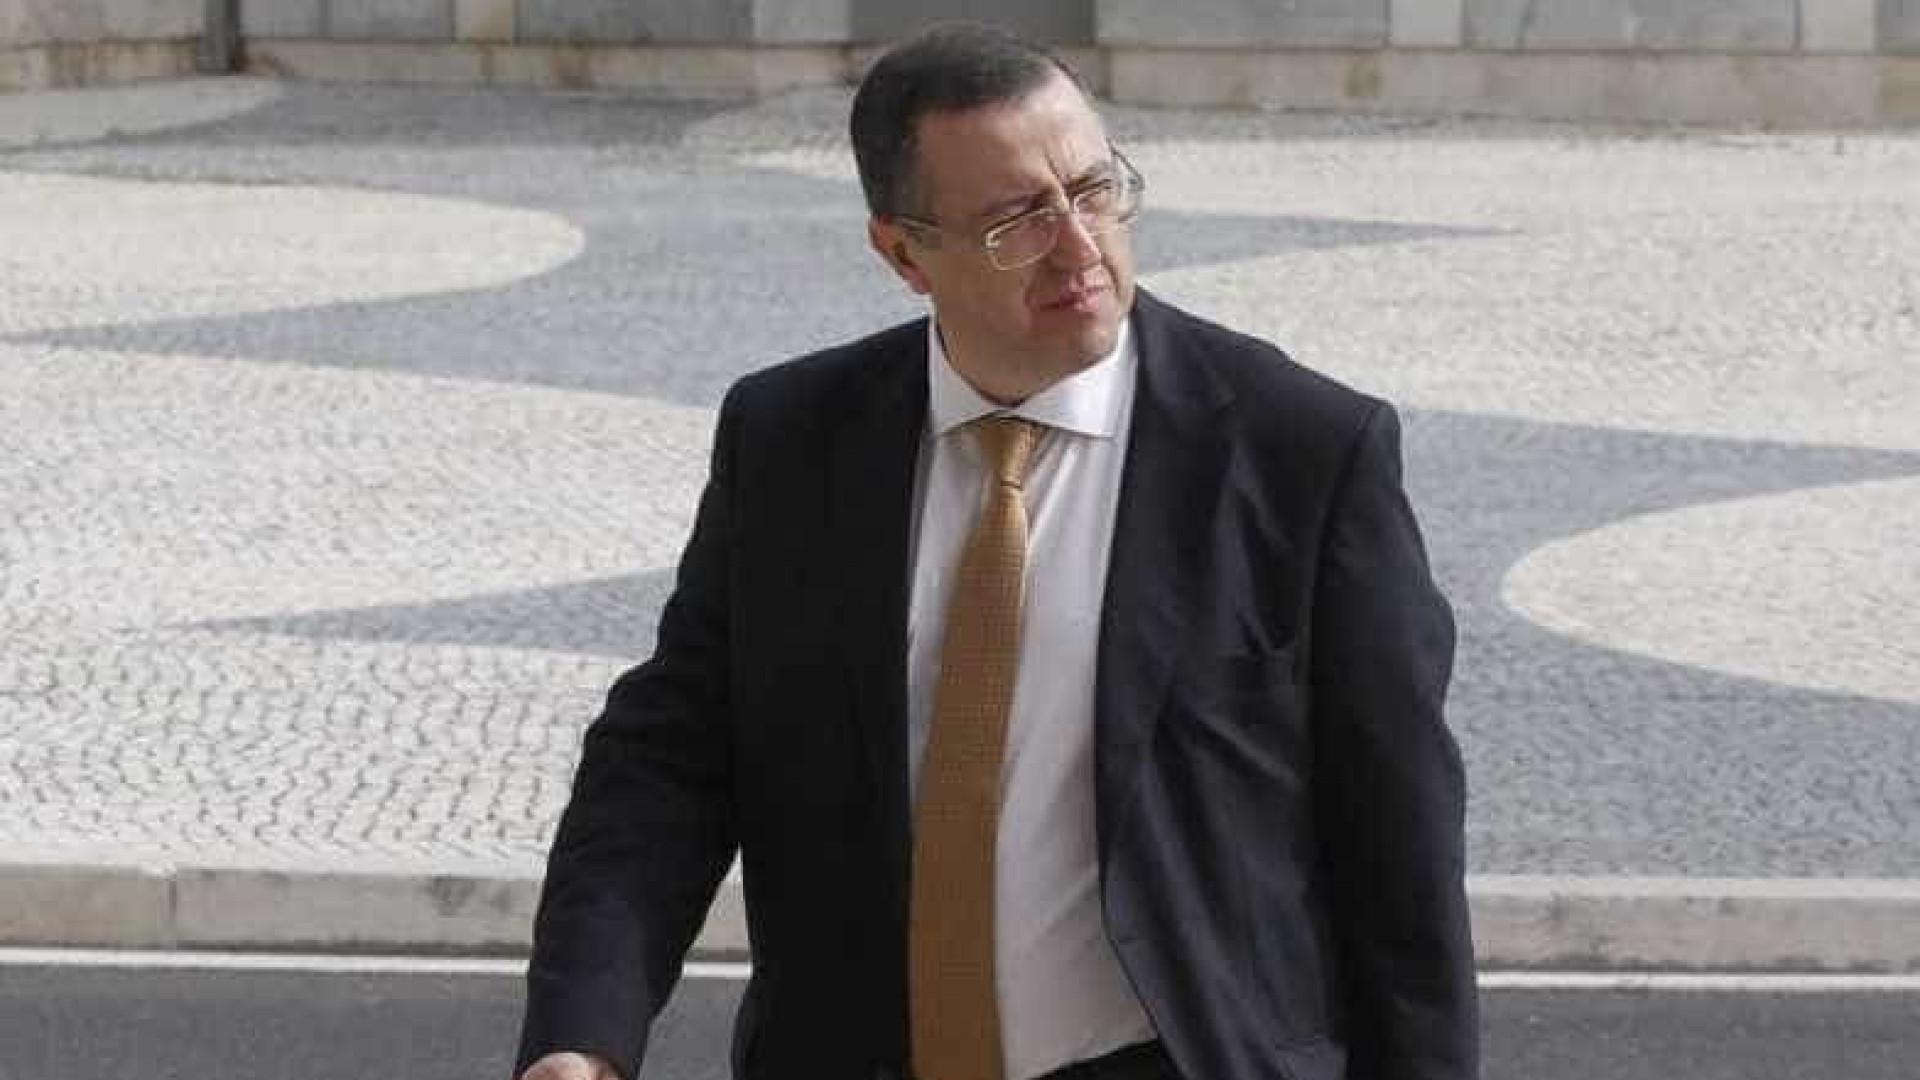 Fizz: Carlos Alexandre tentou demover Orlando Figueira de sair do MP